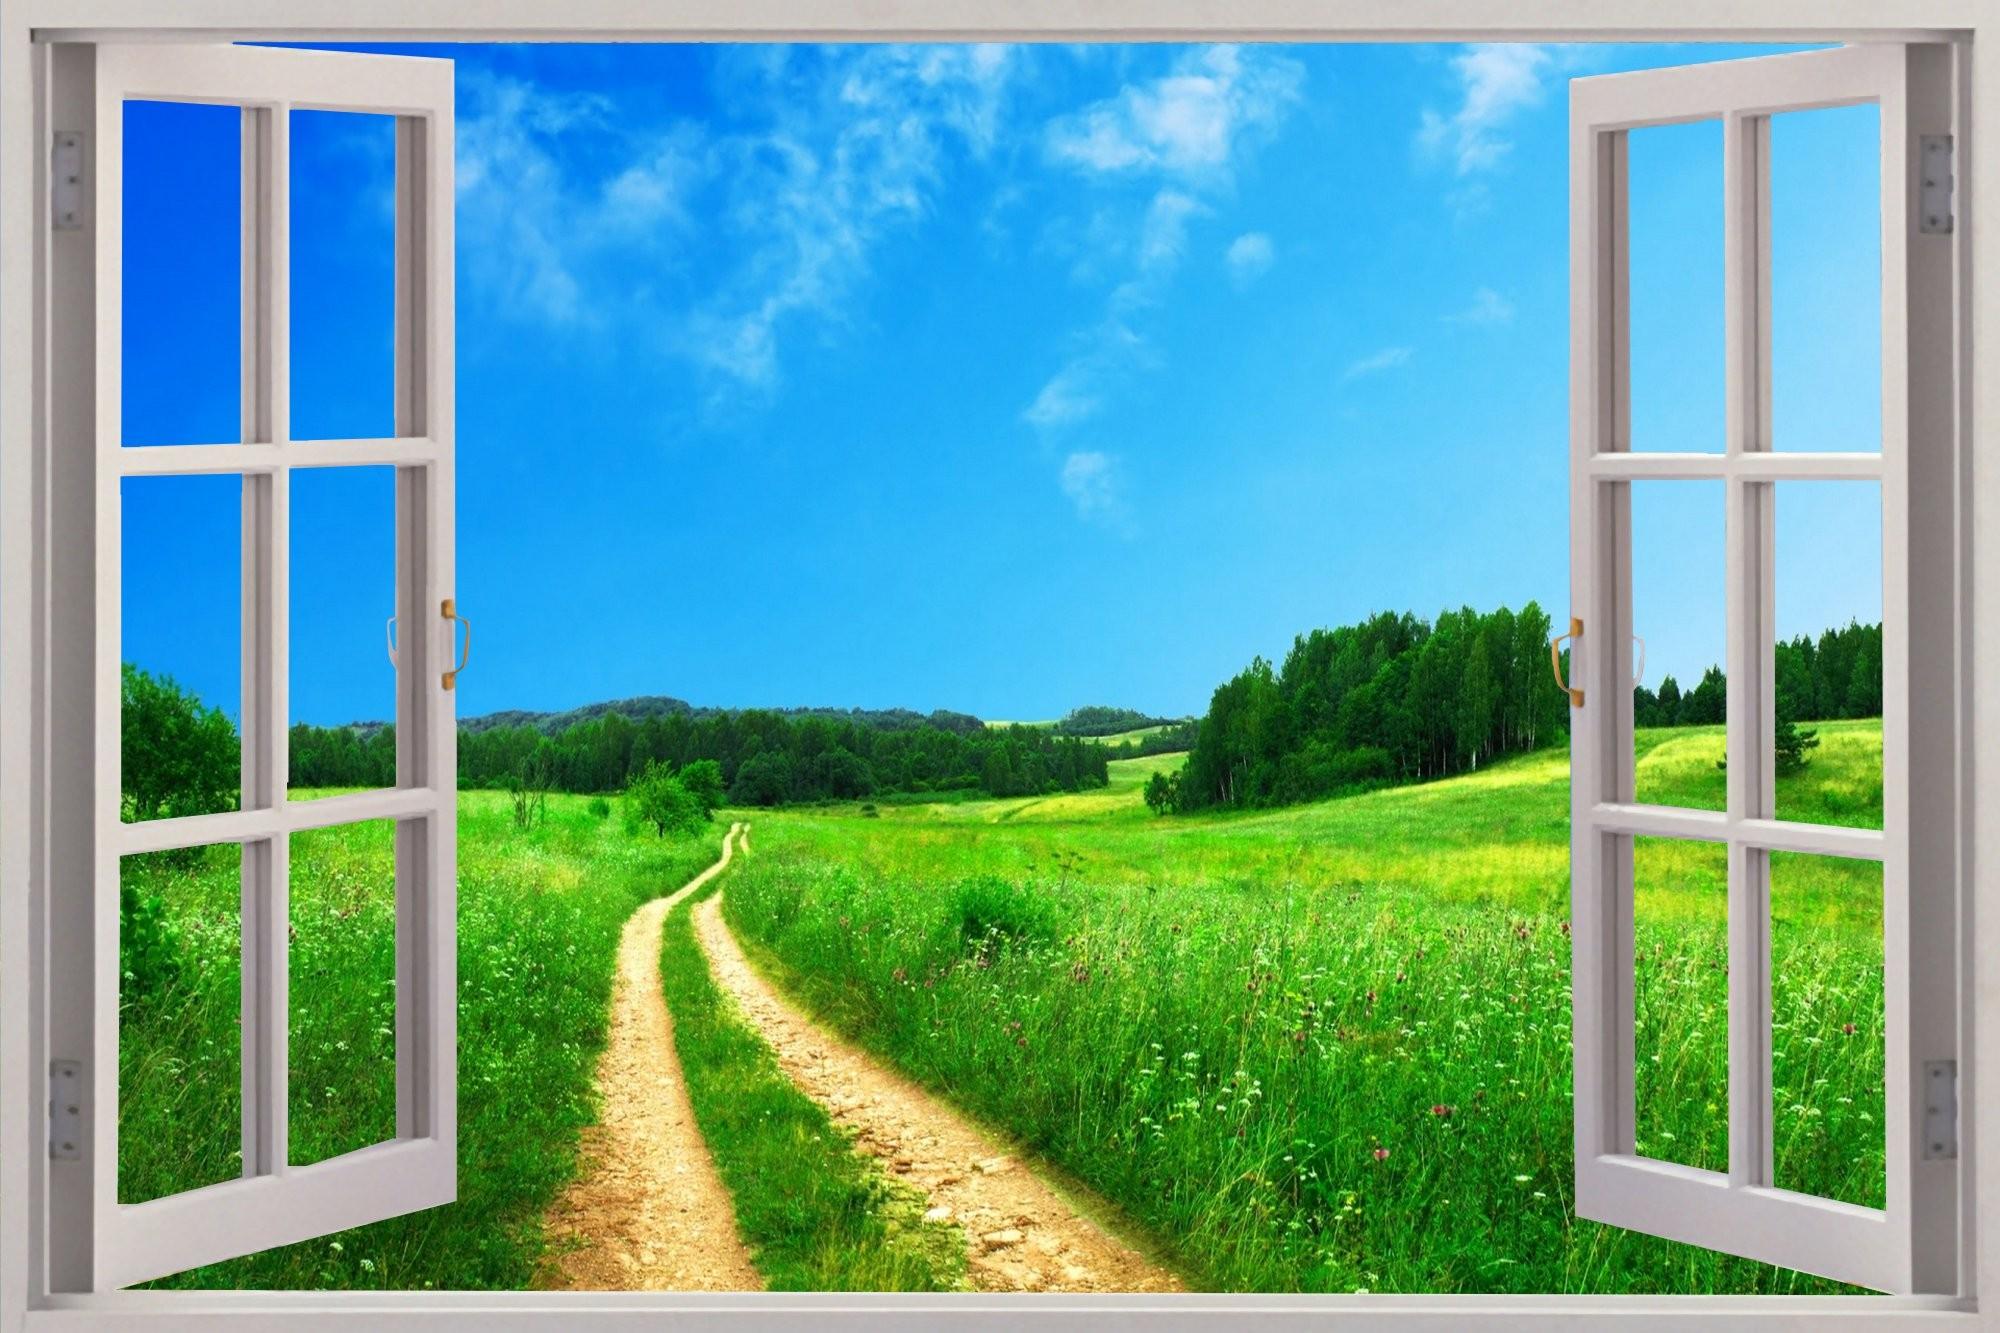 Wallpaper Smartphone 3d Window Wallpaper 183 ① Download Free Stunning Hd Wallpapers